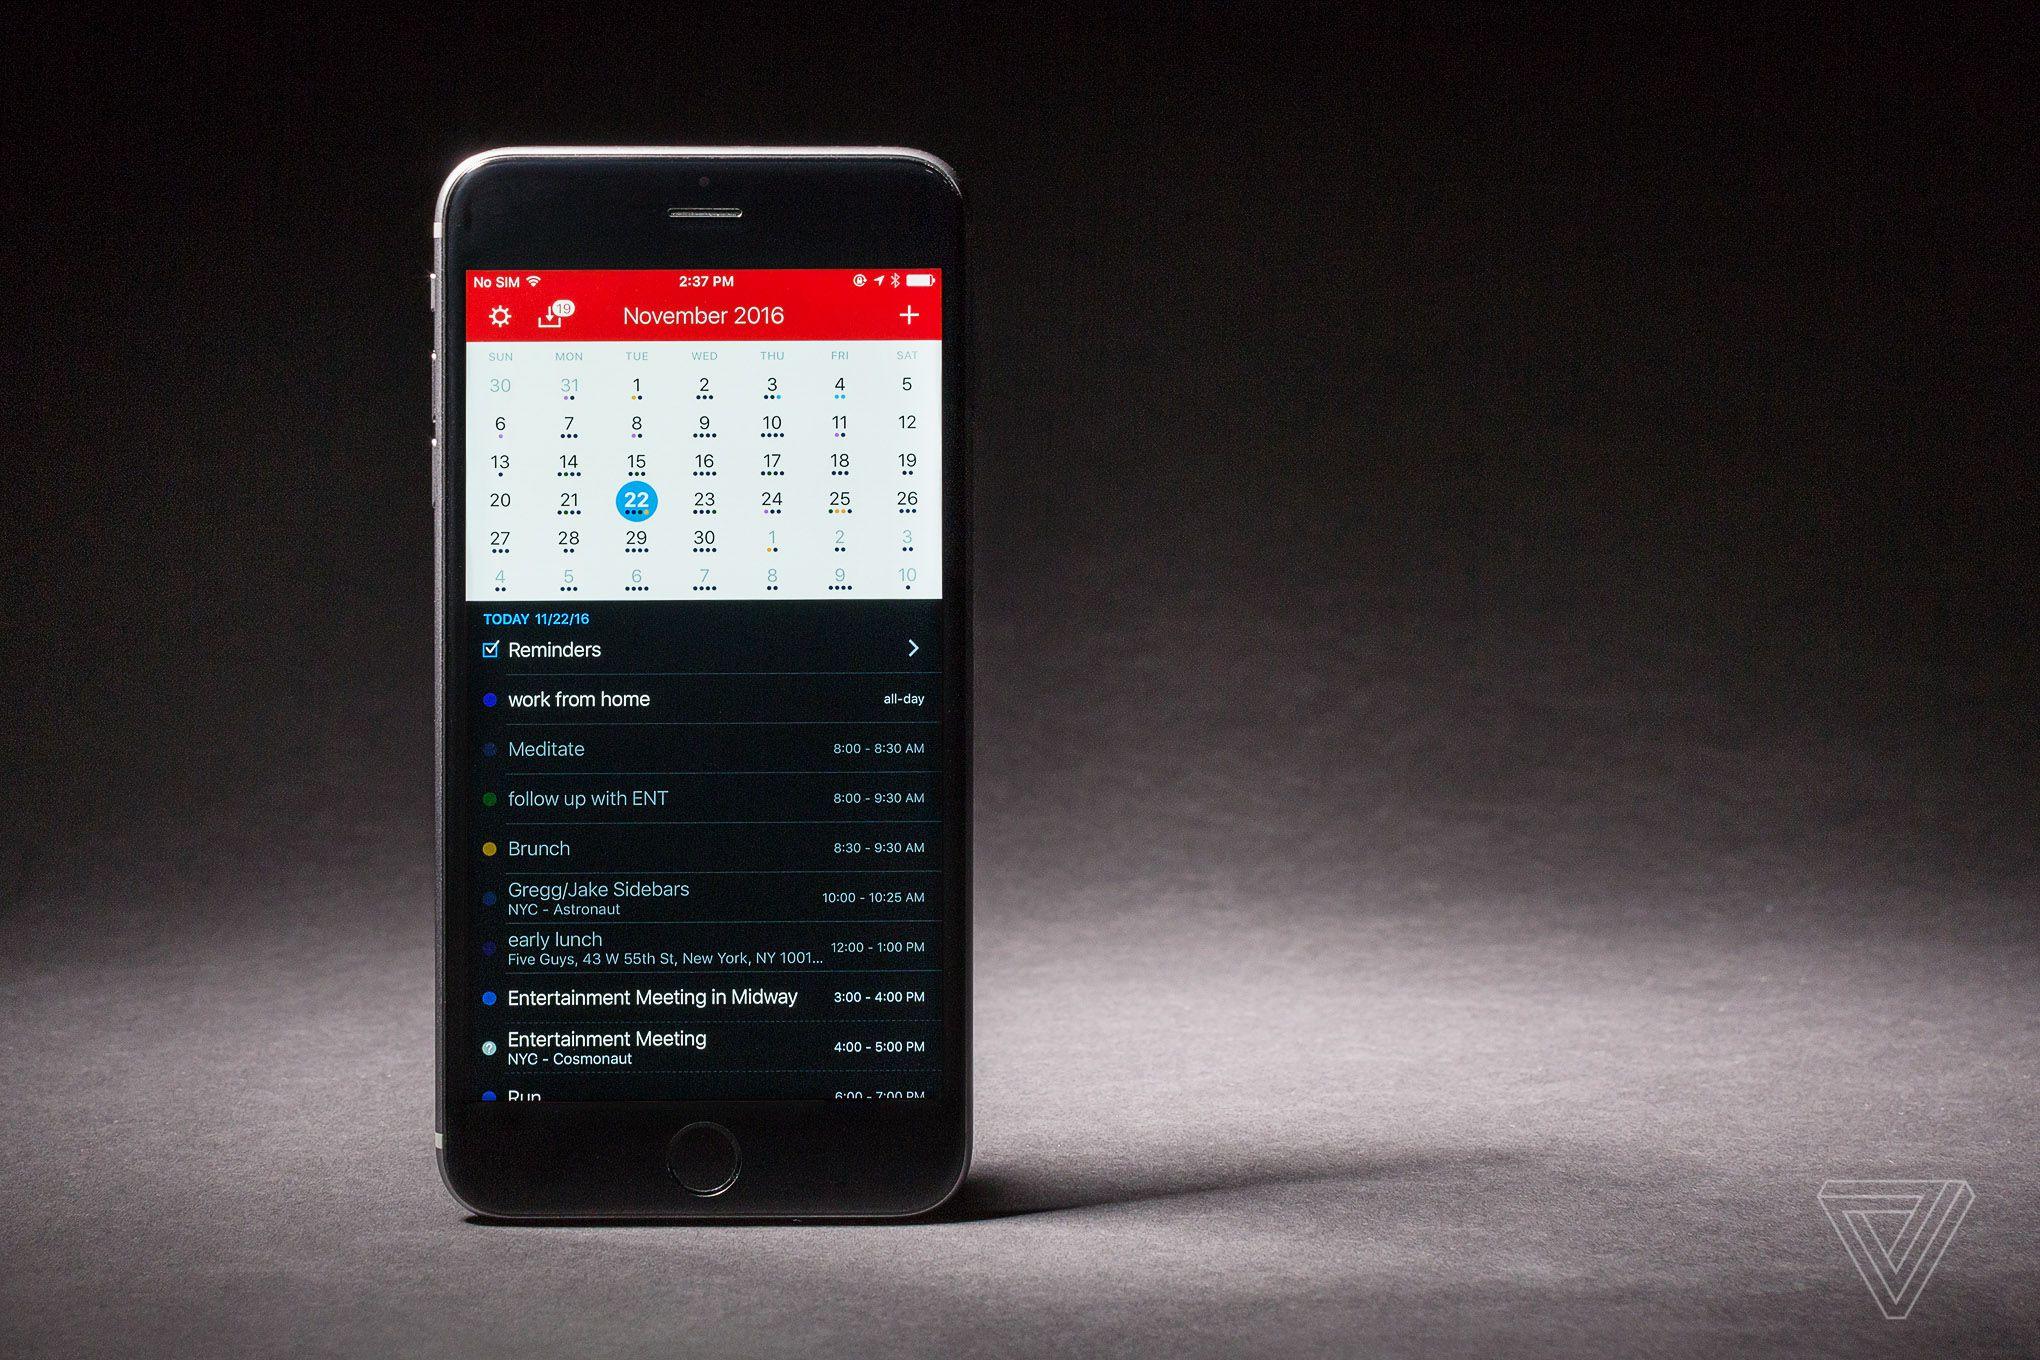 Calendar App For Iphone : The best calendar app for iphone verge